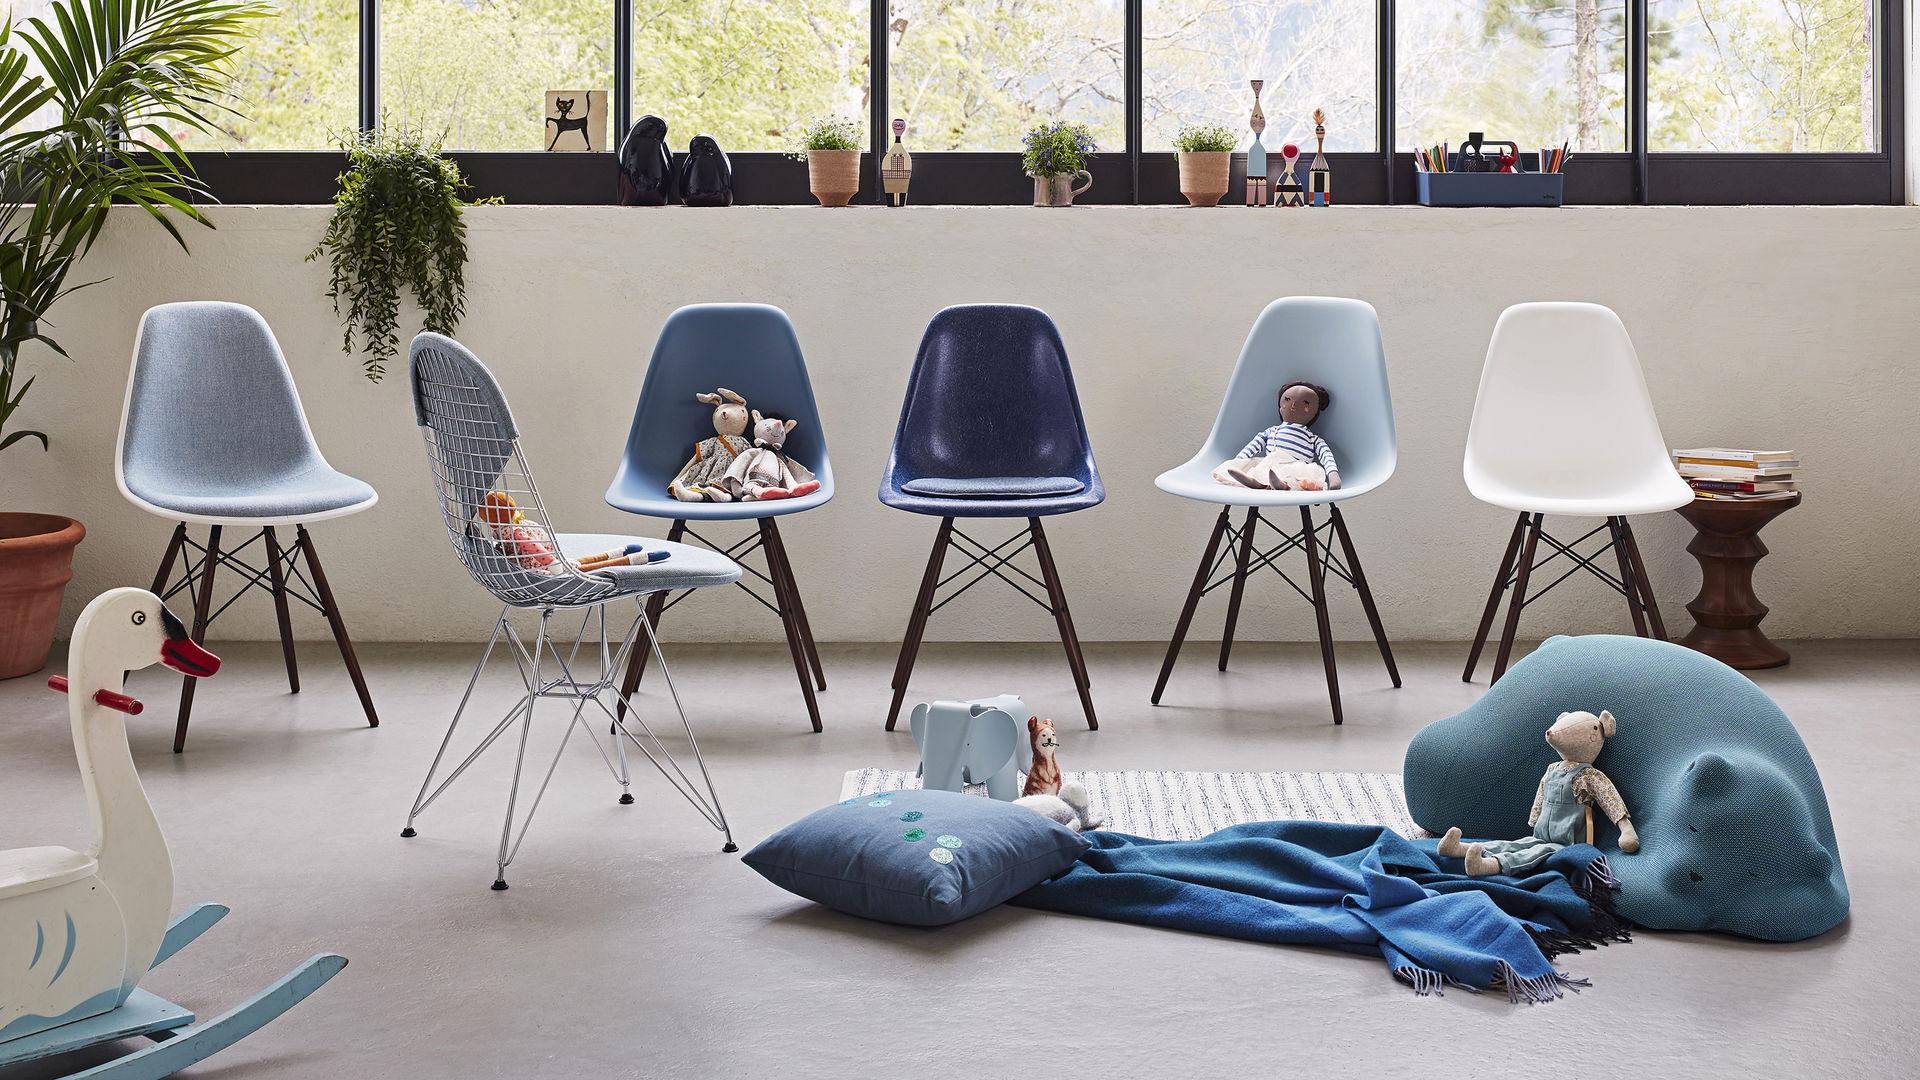 Eames Fiberglass Side Chair DSW Eames Plastic Side Chair DSW Eames Wire Shell DKR_Web_16-9